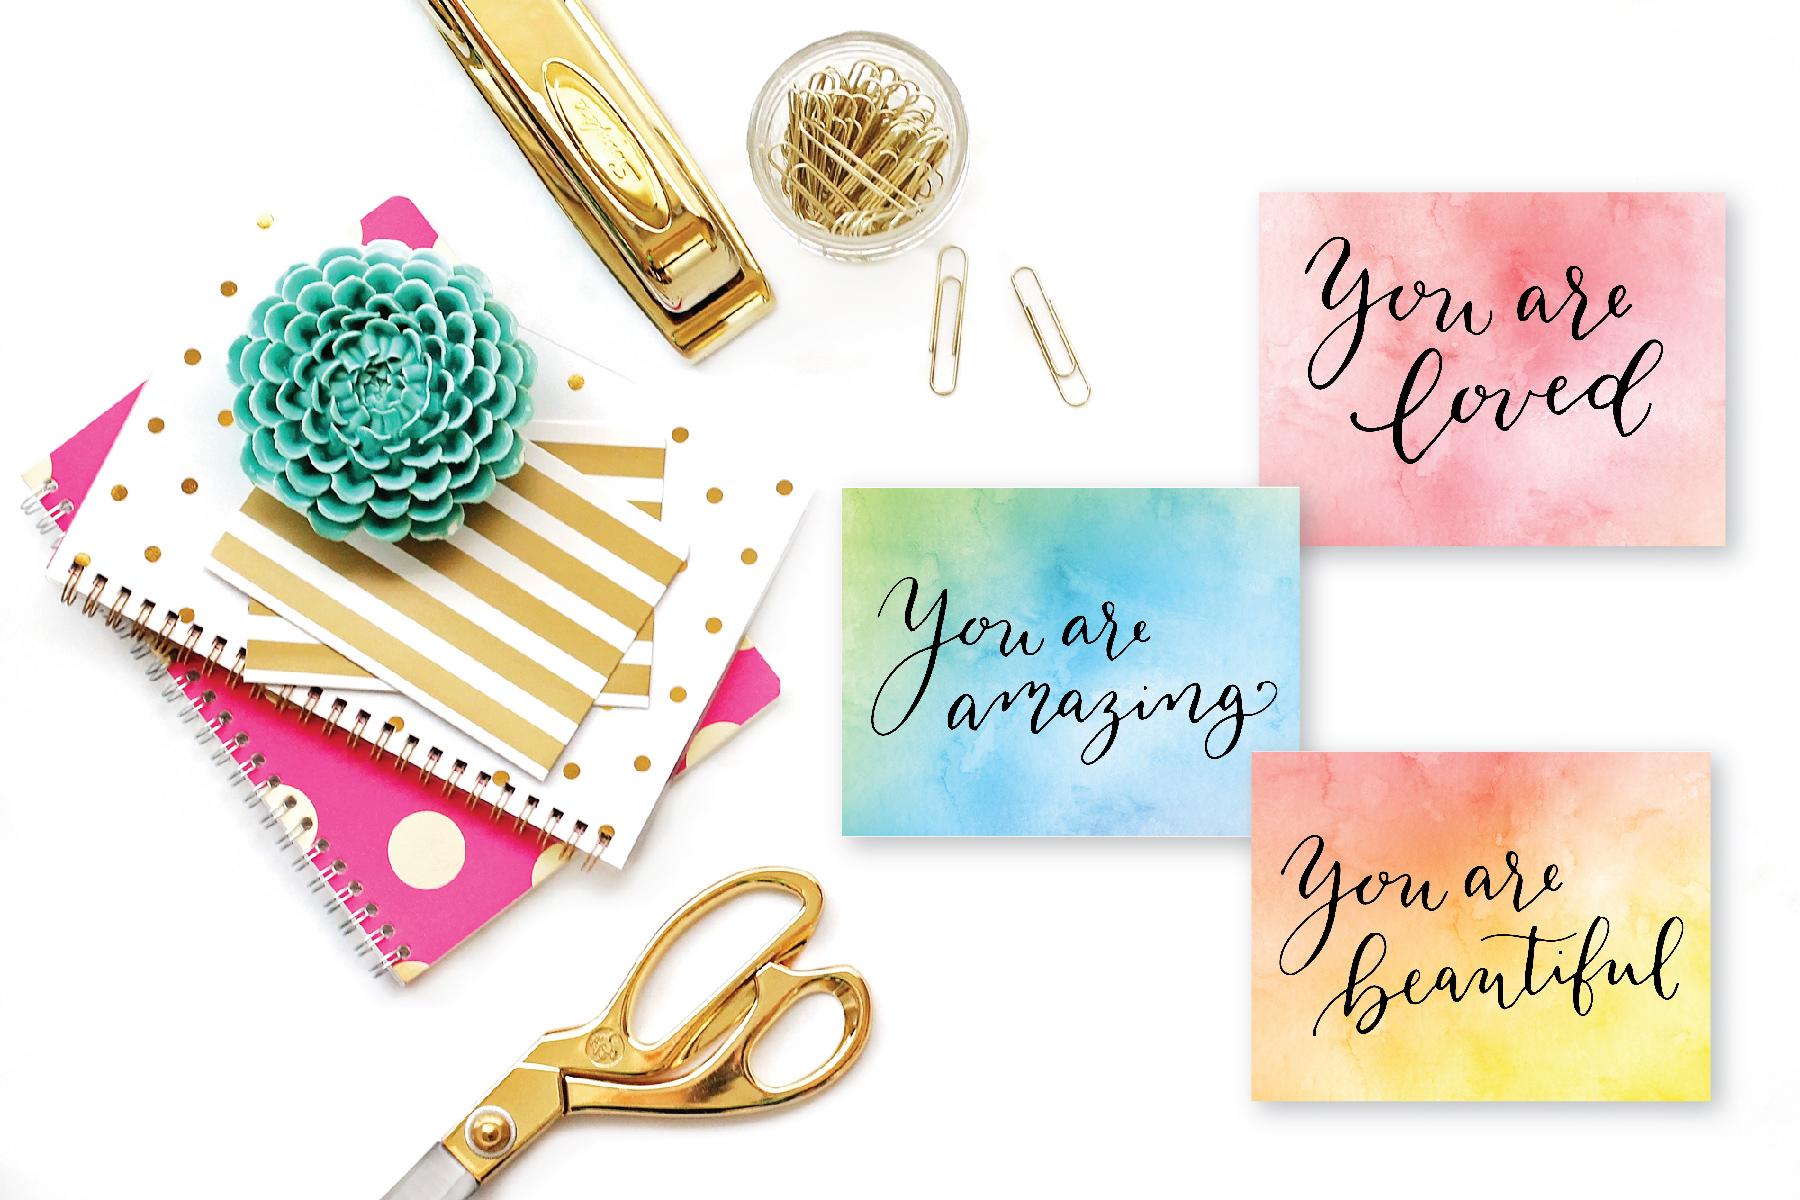 norecards for charity watercolor sayings.jpg